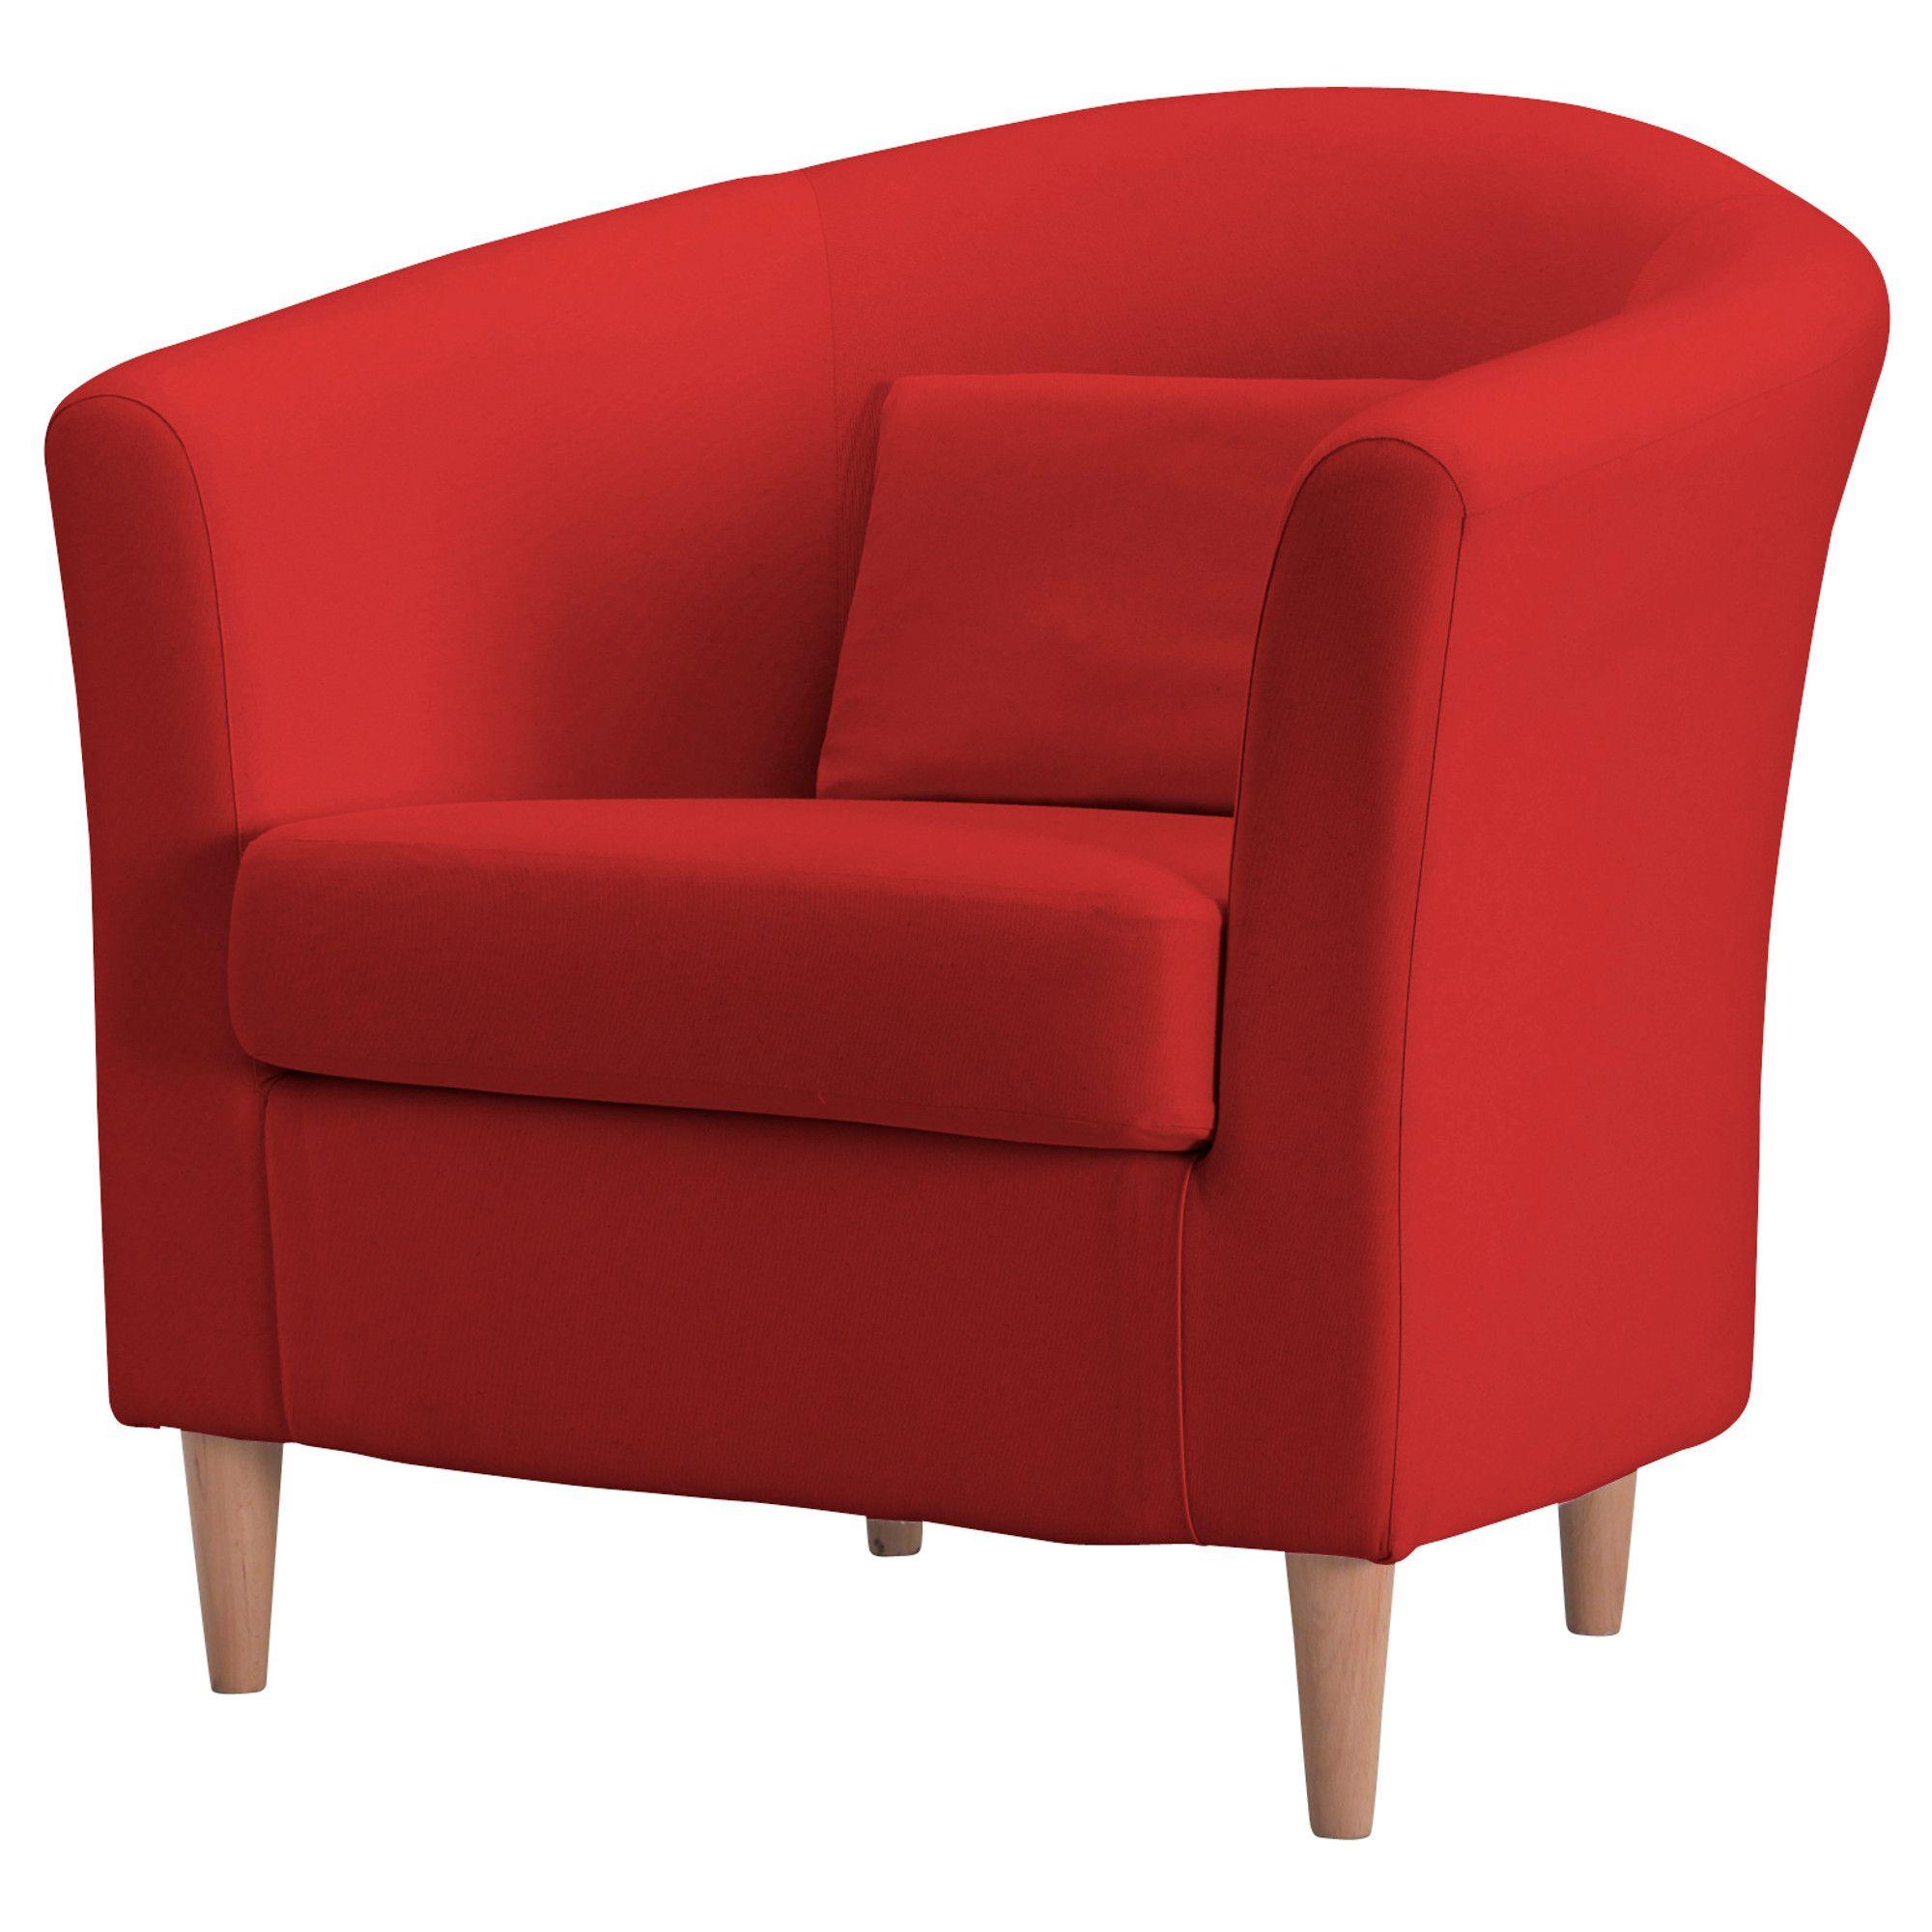 Ikea Us Furniture And Home Furnishings Ikea Chair Red Chair Ikea Armchair